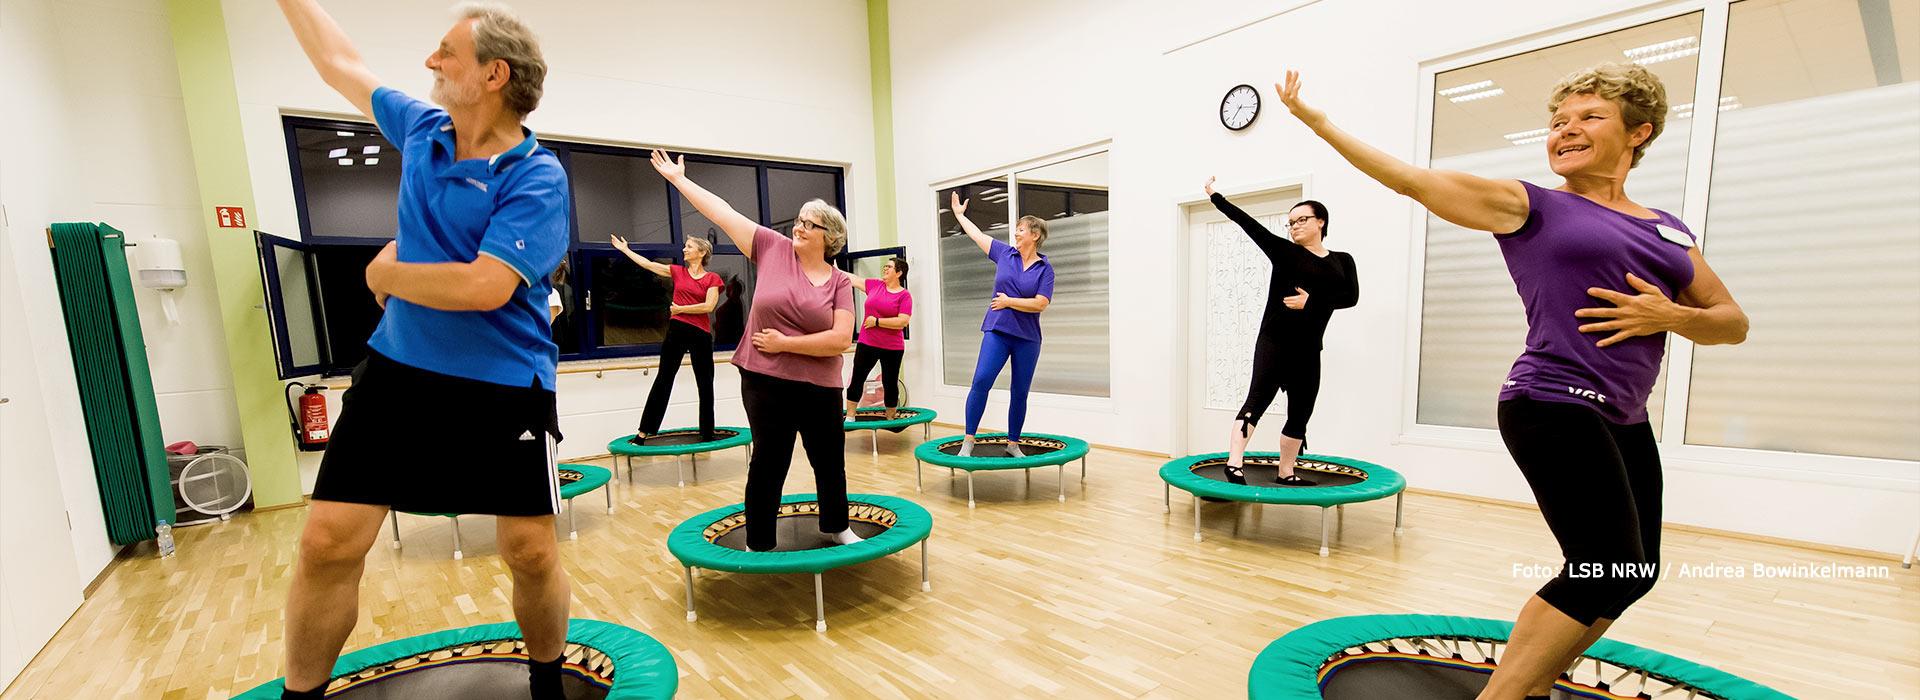 <small>Rebounding und Jumping Fitness:</small>In Schwung kommen